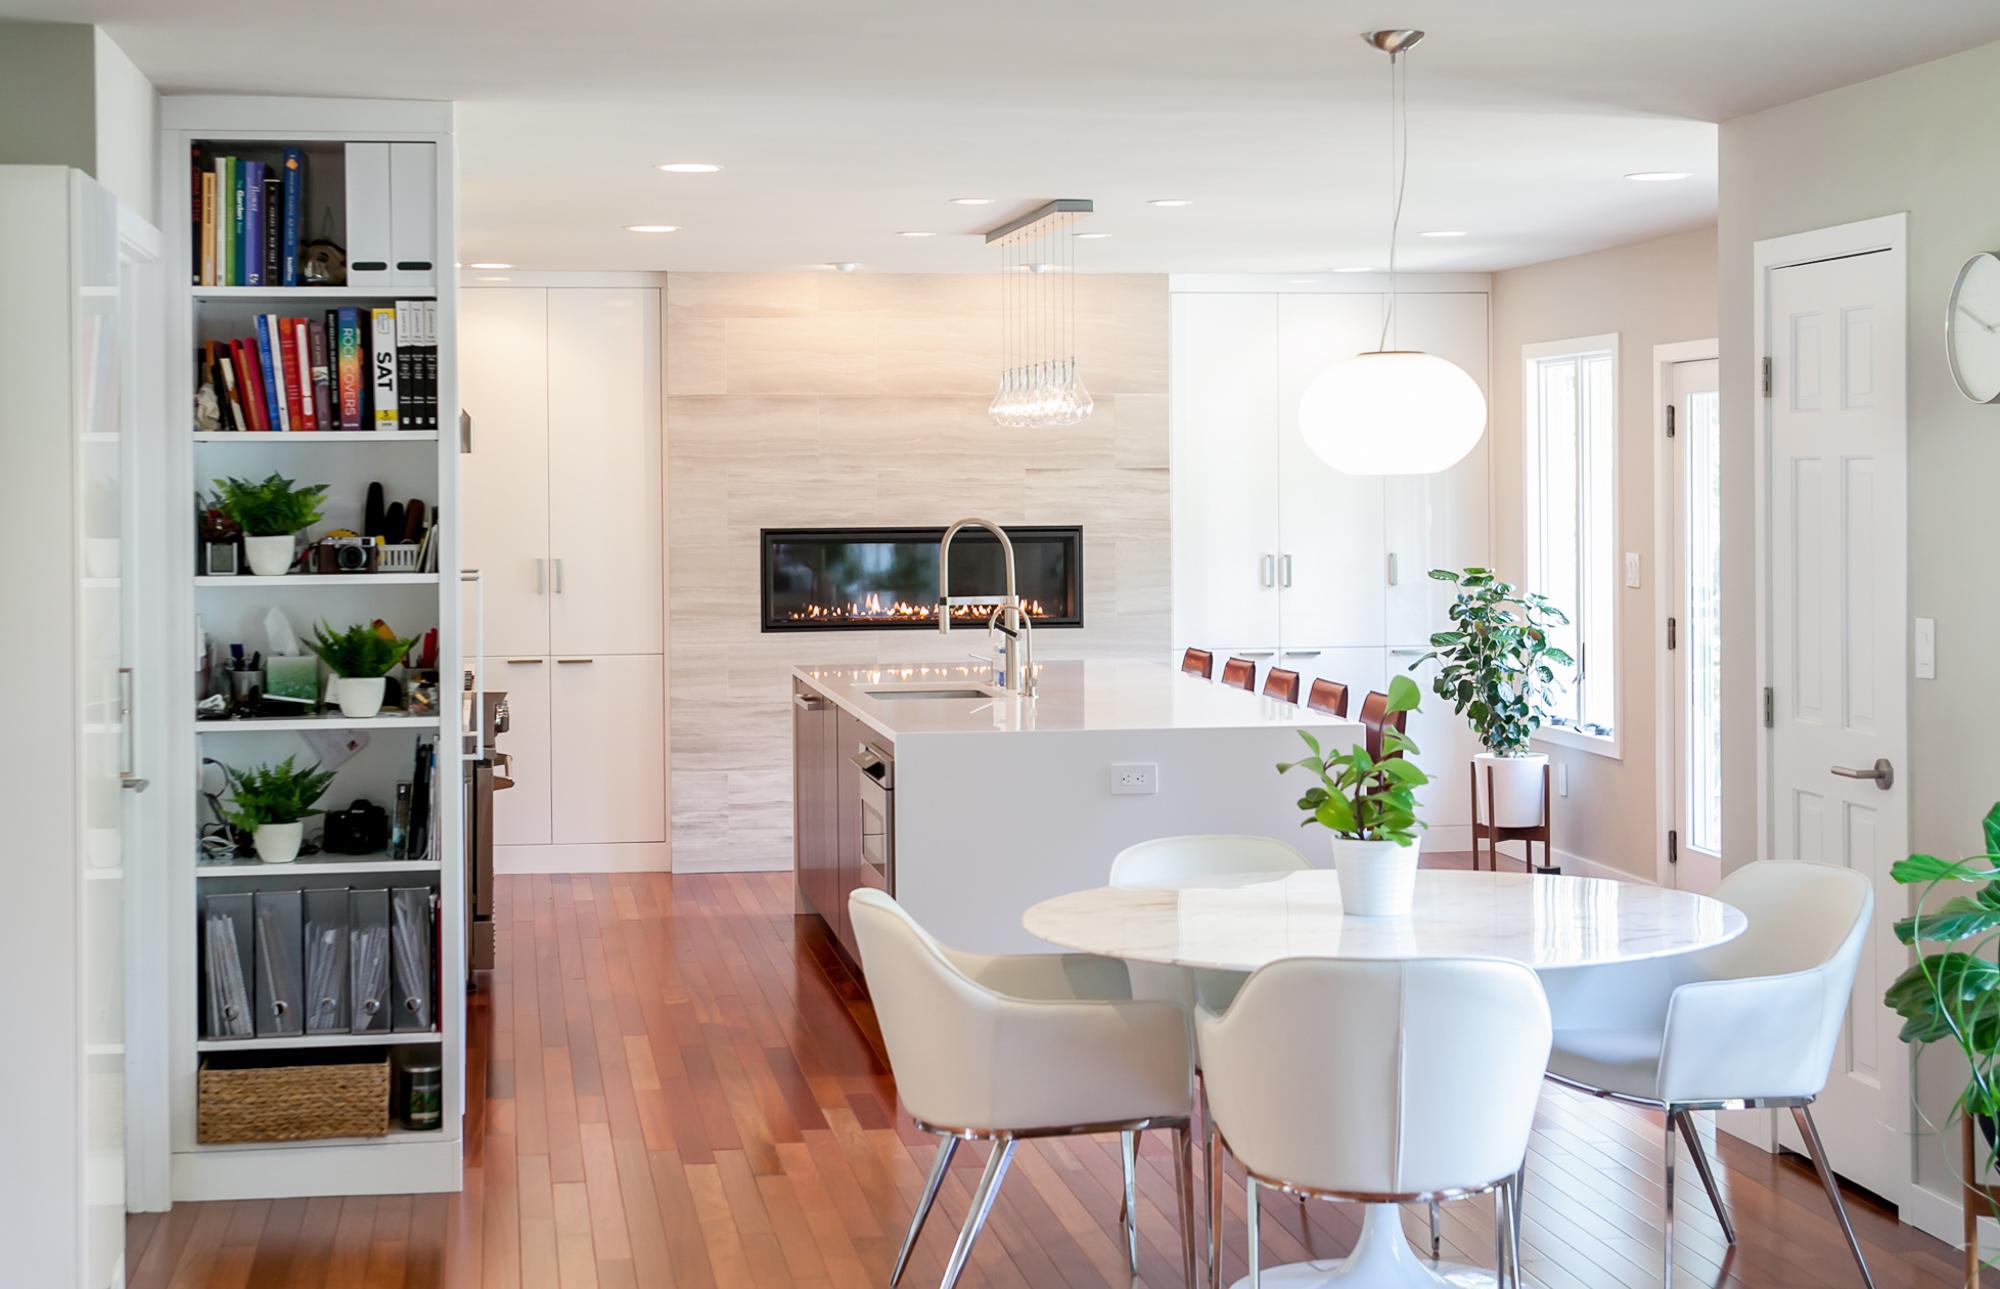 White furniture with bookshelf outside of kitchen